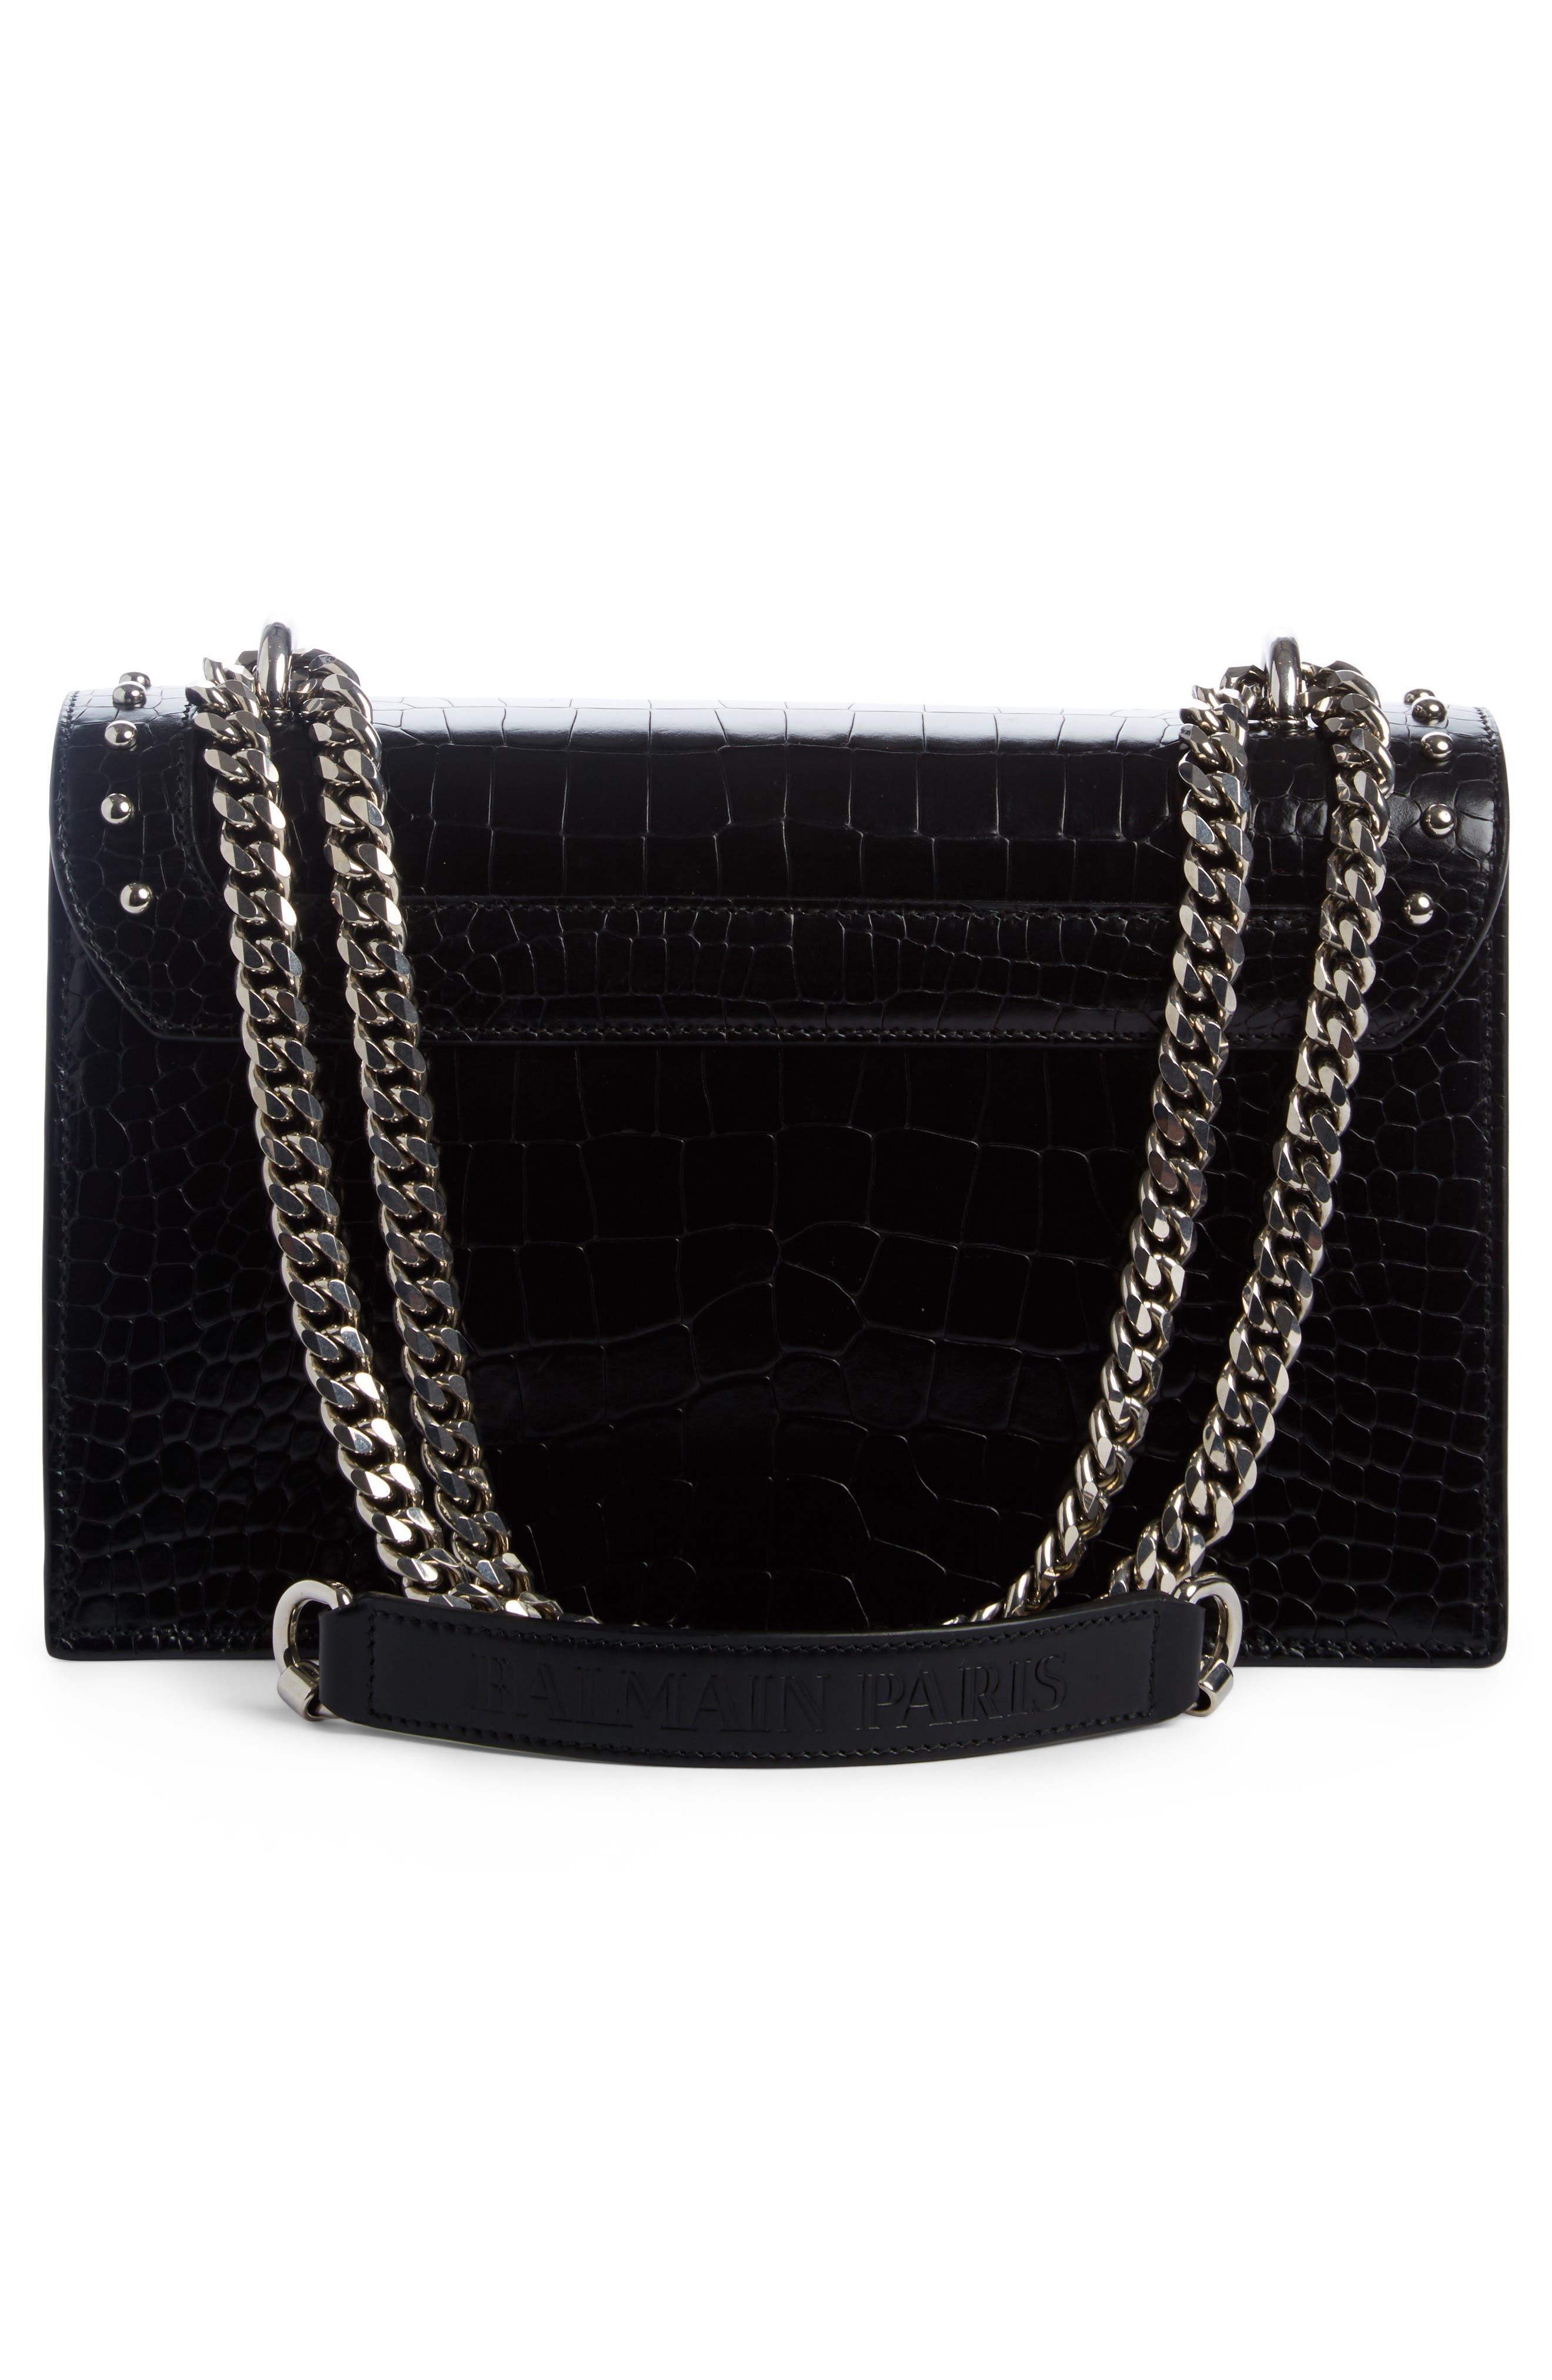 Balmain Handbags   Wallets for Women   Nordstrom 2c5412d1e7